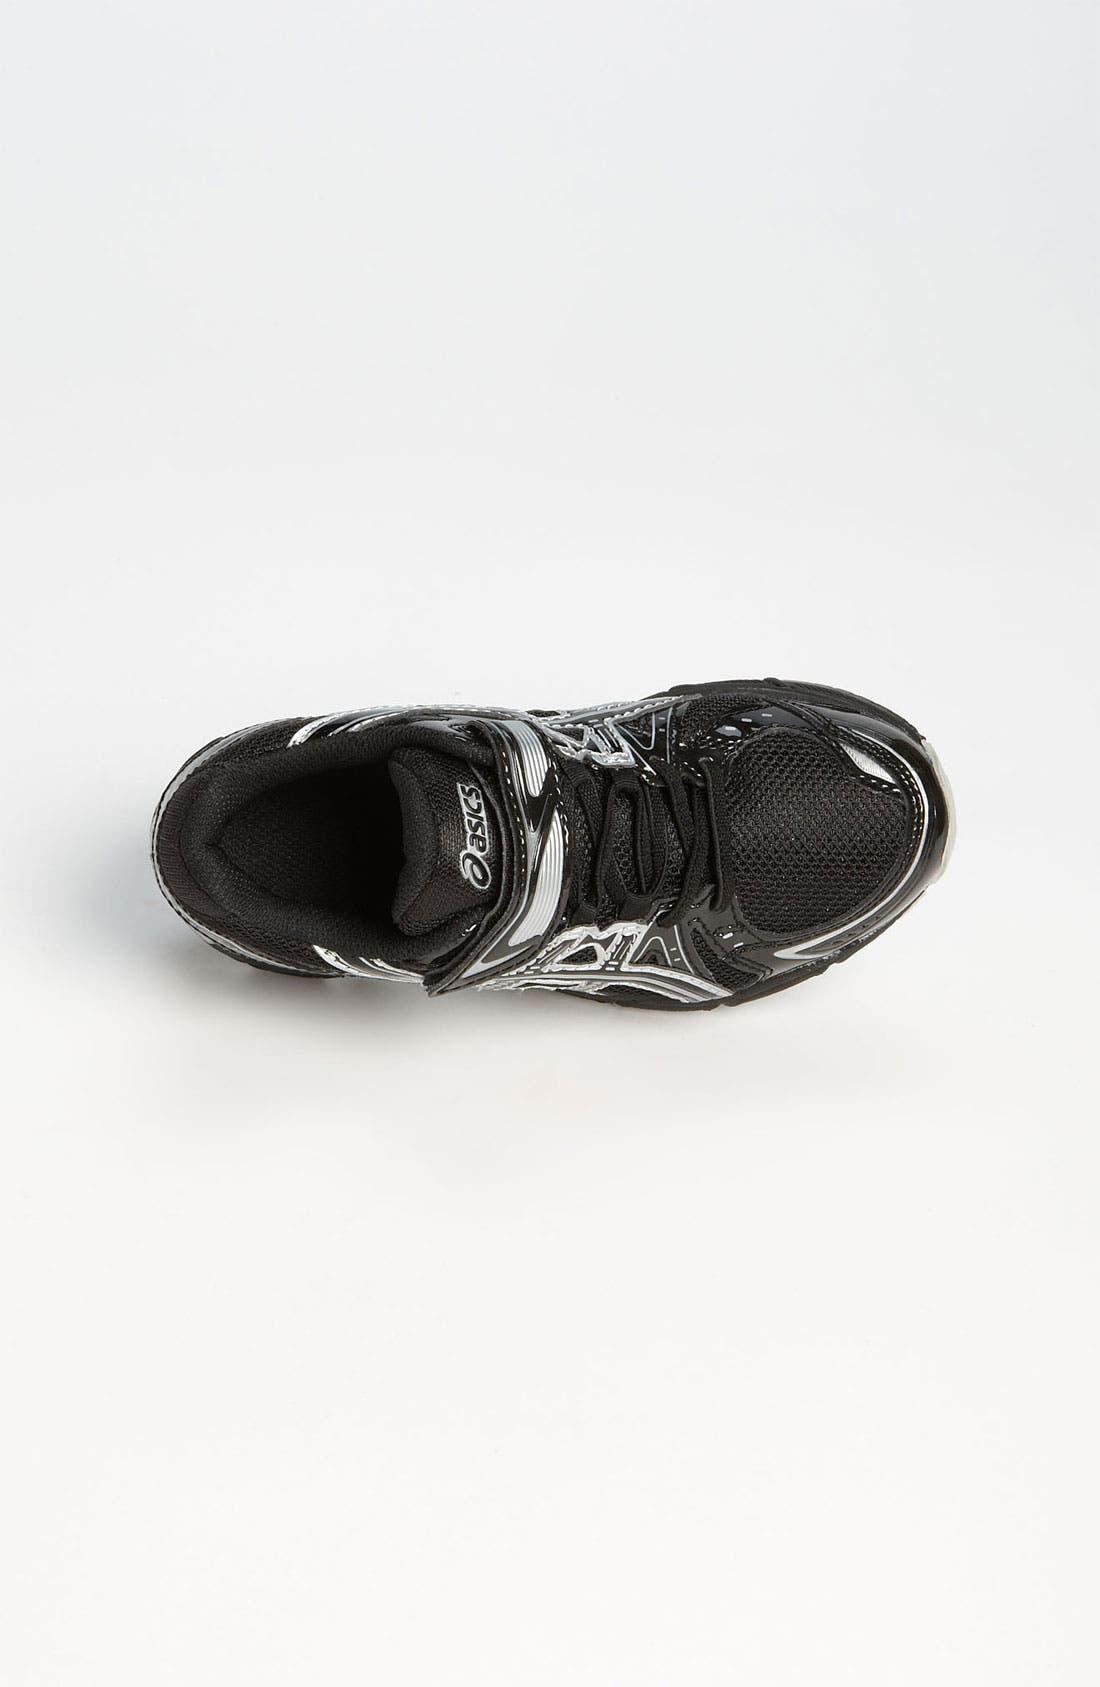 Alternate Image 3  - ASICS® 'GEL®-1170™' Running Shoe (Toddler, Little Kid & Big Kid)